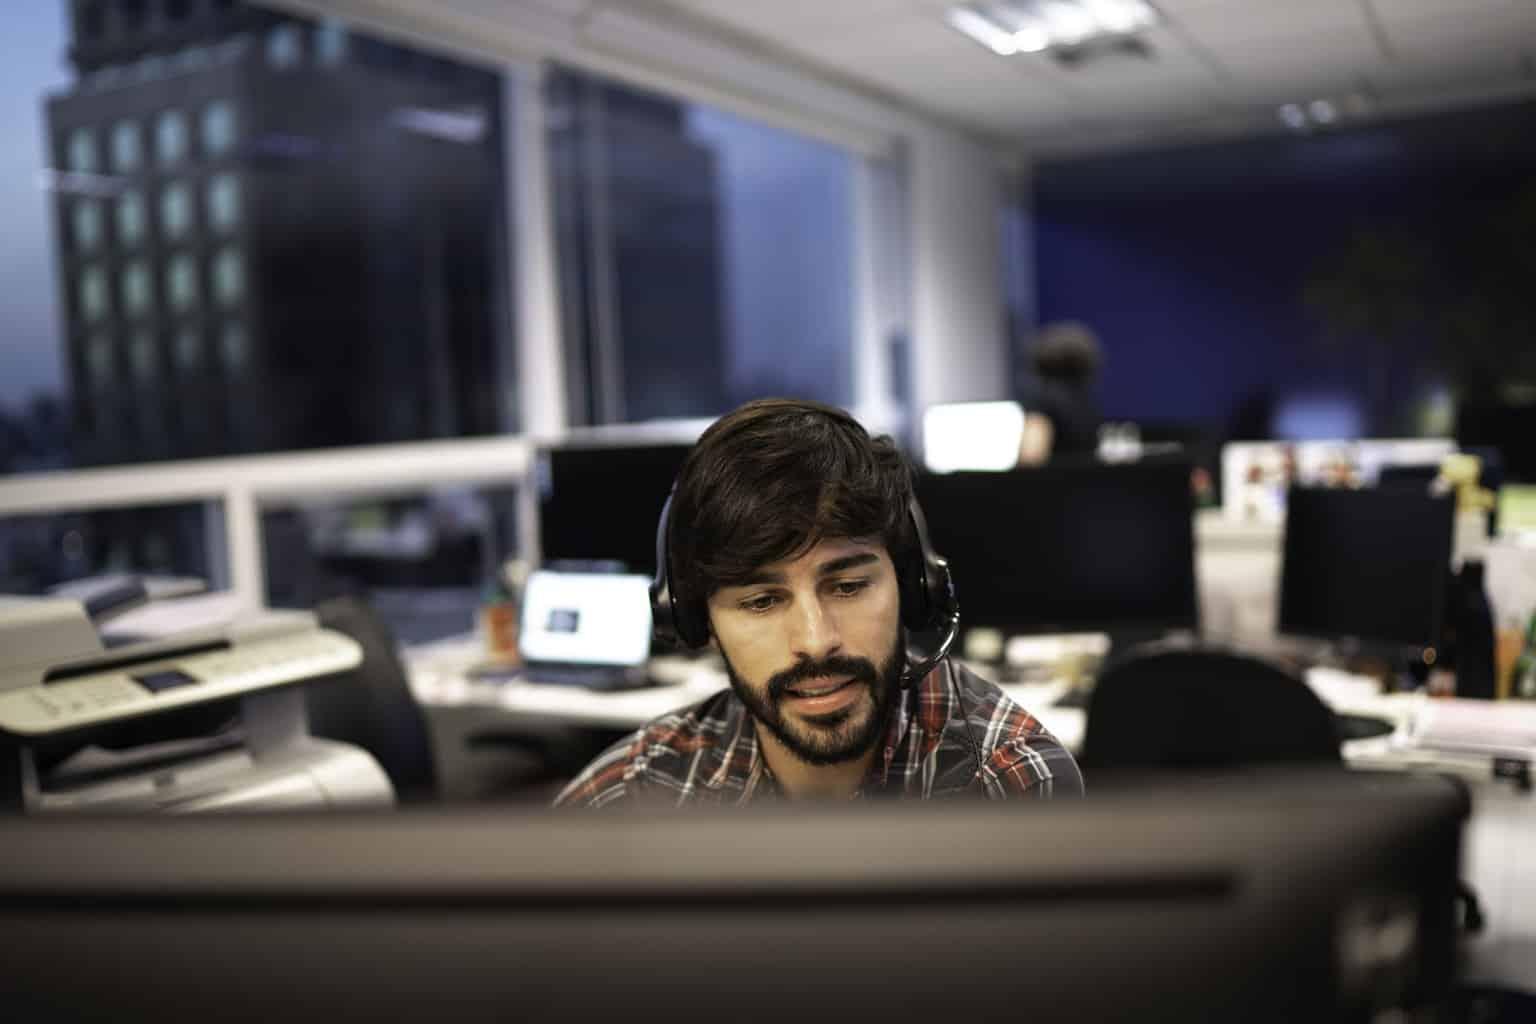 man working on computer - C3 Tech